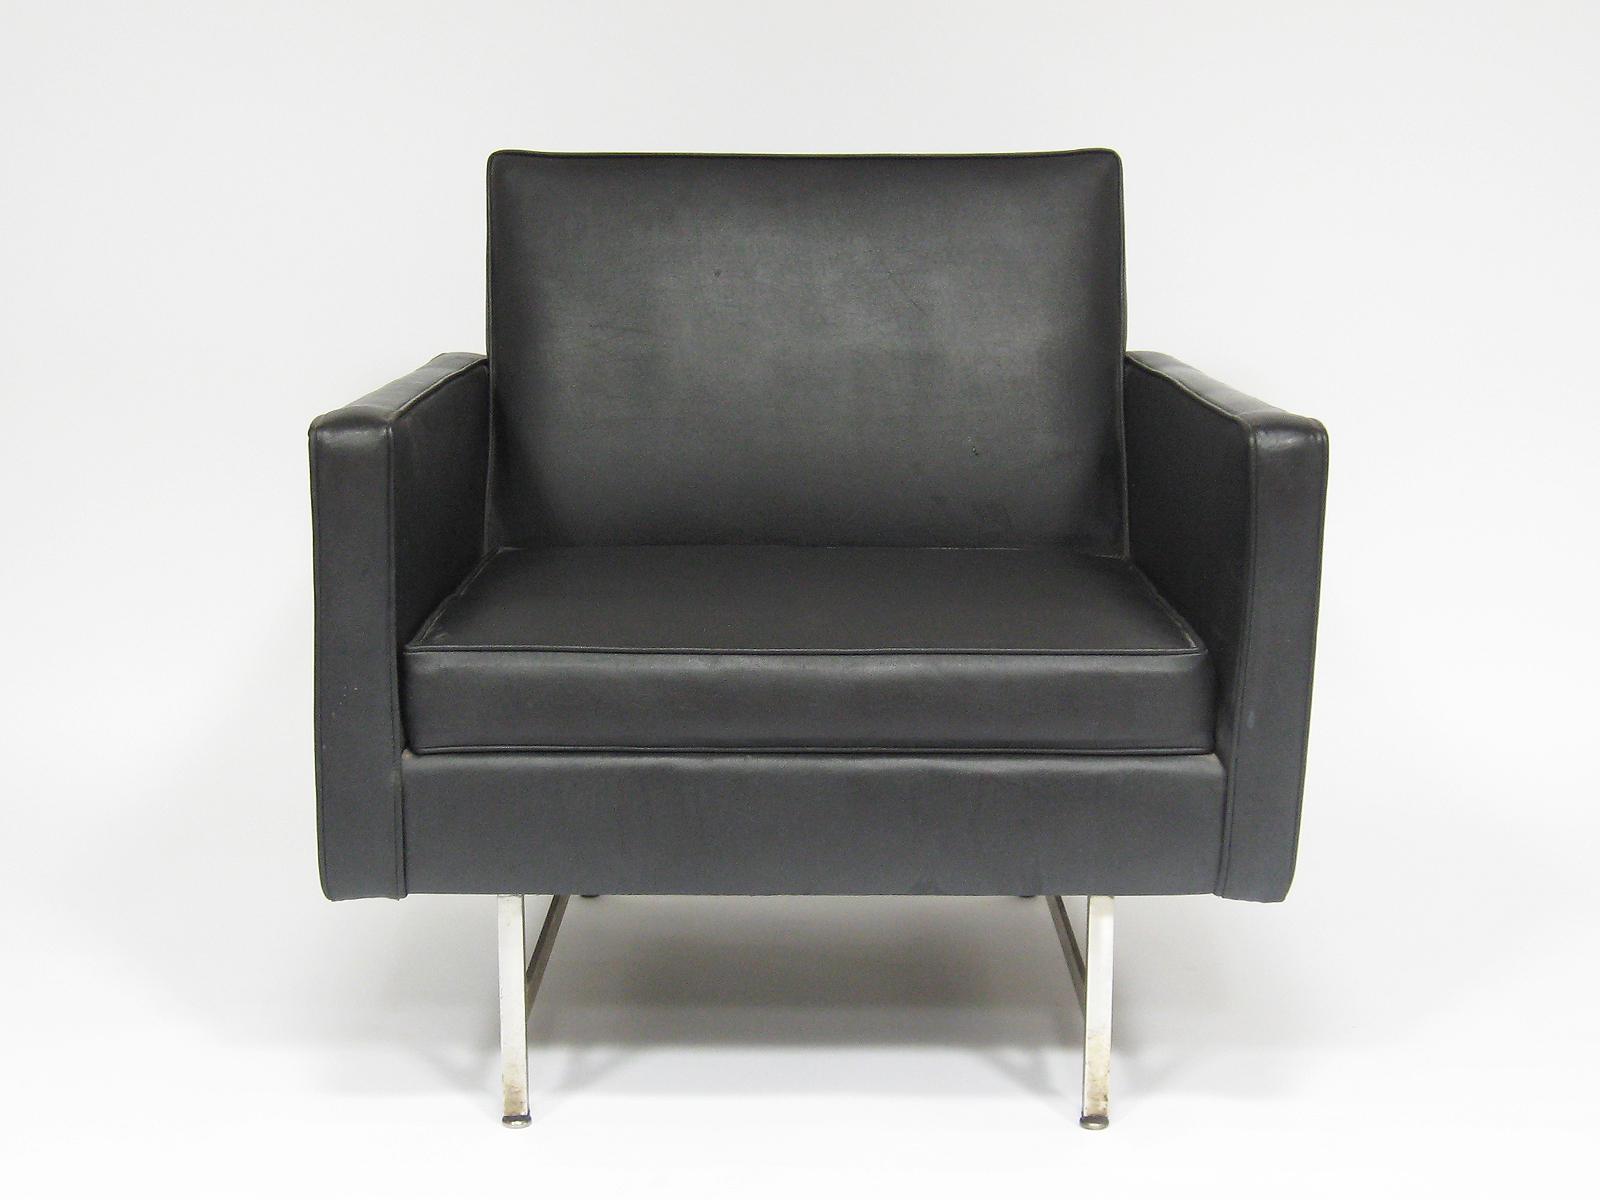 McCobb Lounge Chair by Custom Craft